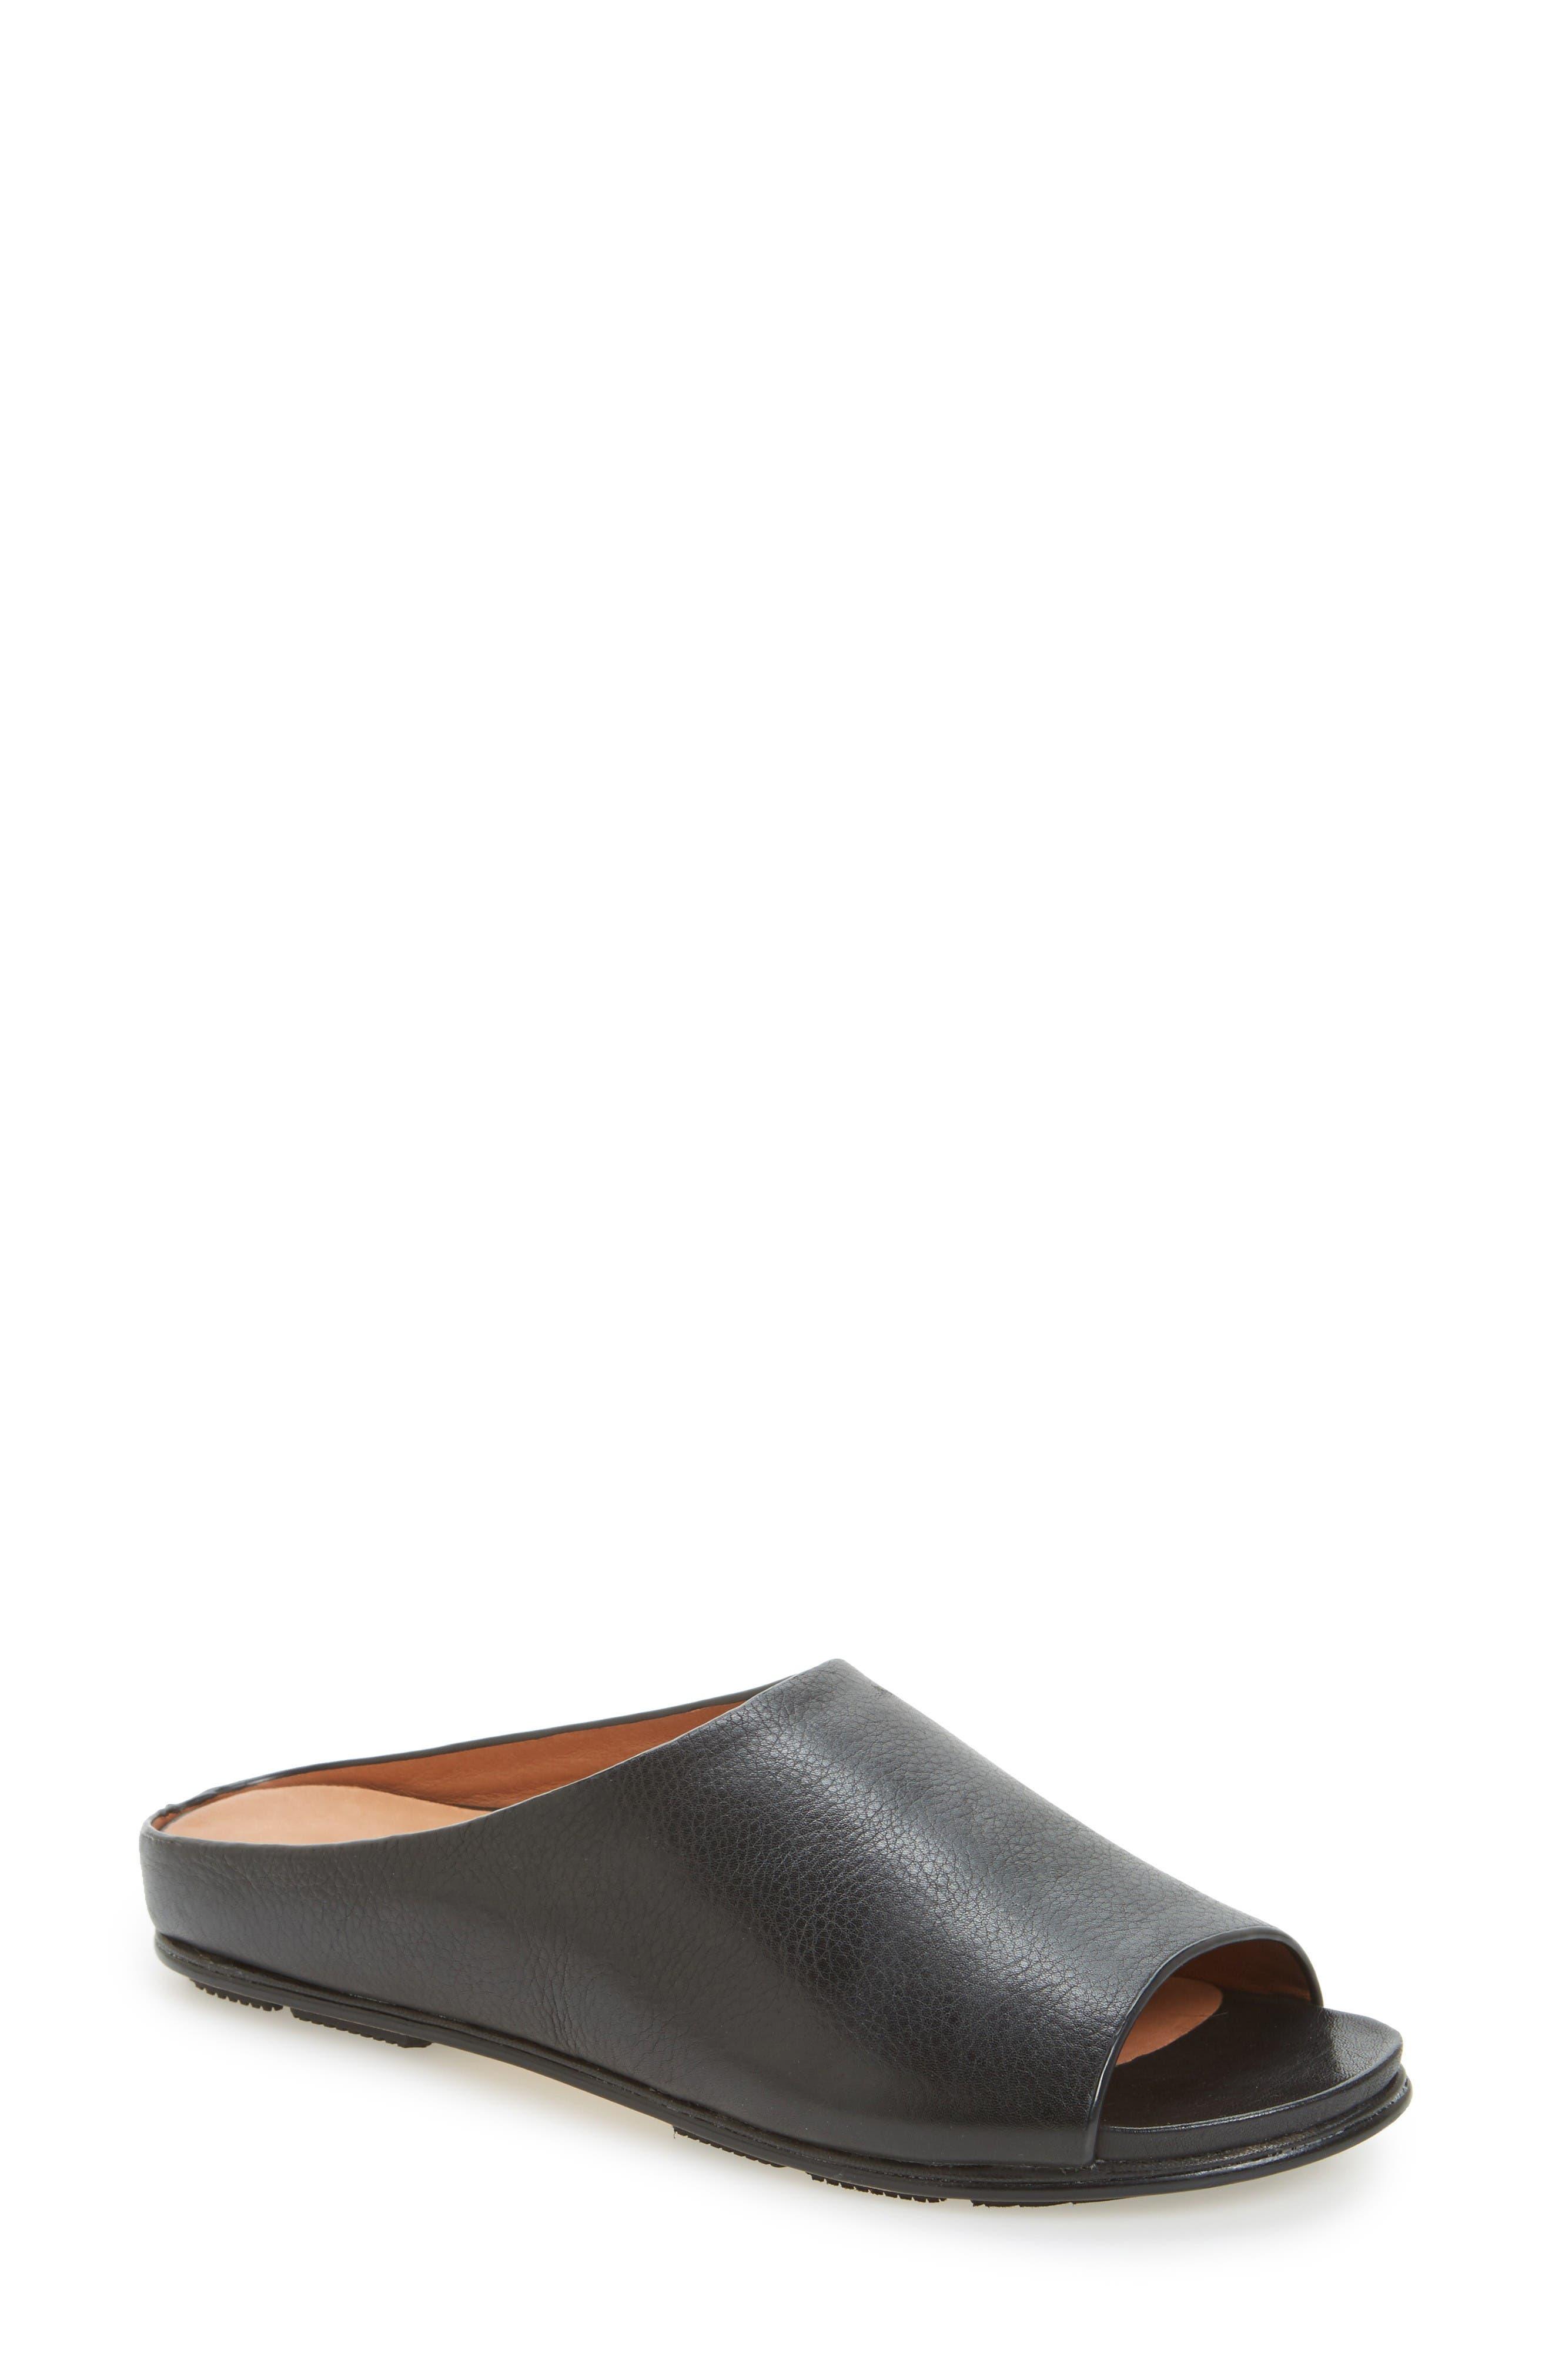 Dijone Mule,                         Main,                         color, Black Leather